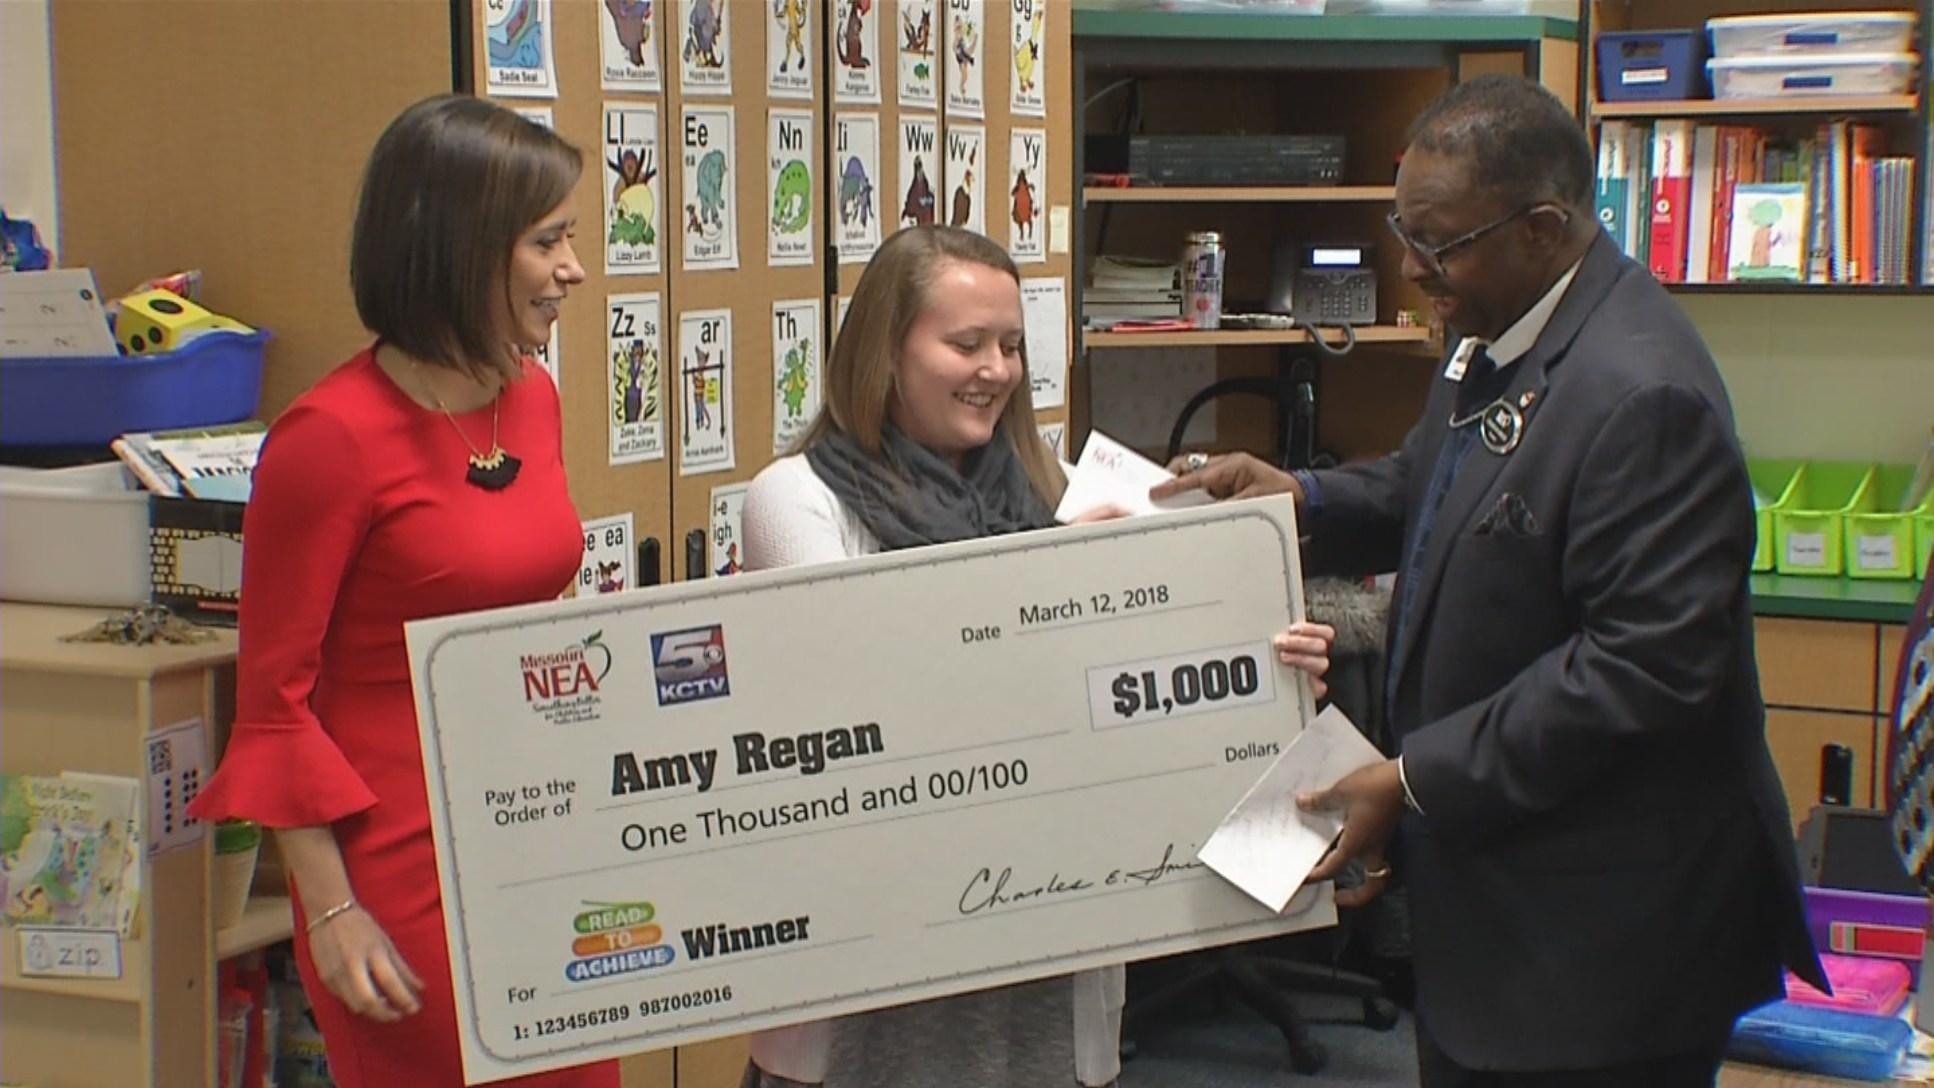 Kindergartenteacher Amy Regan was nominated by one of her students. (KCTV5)